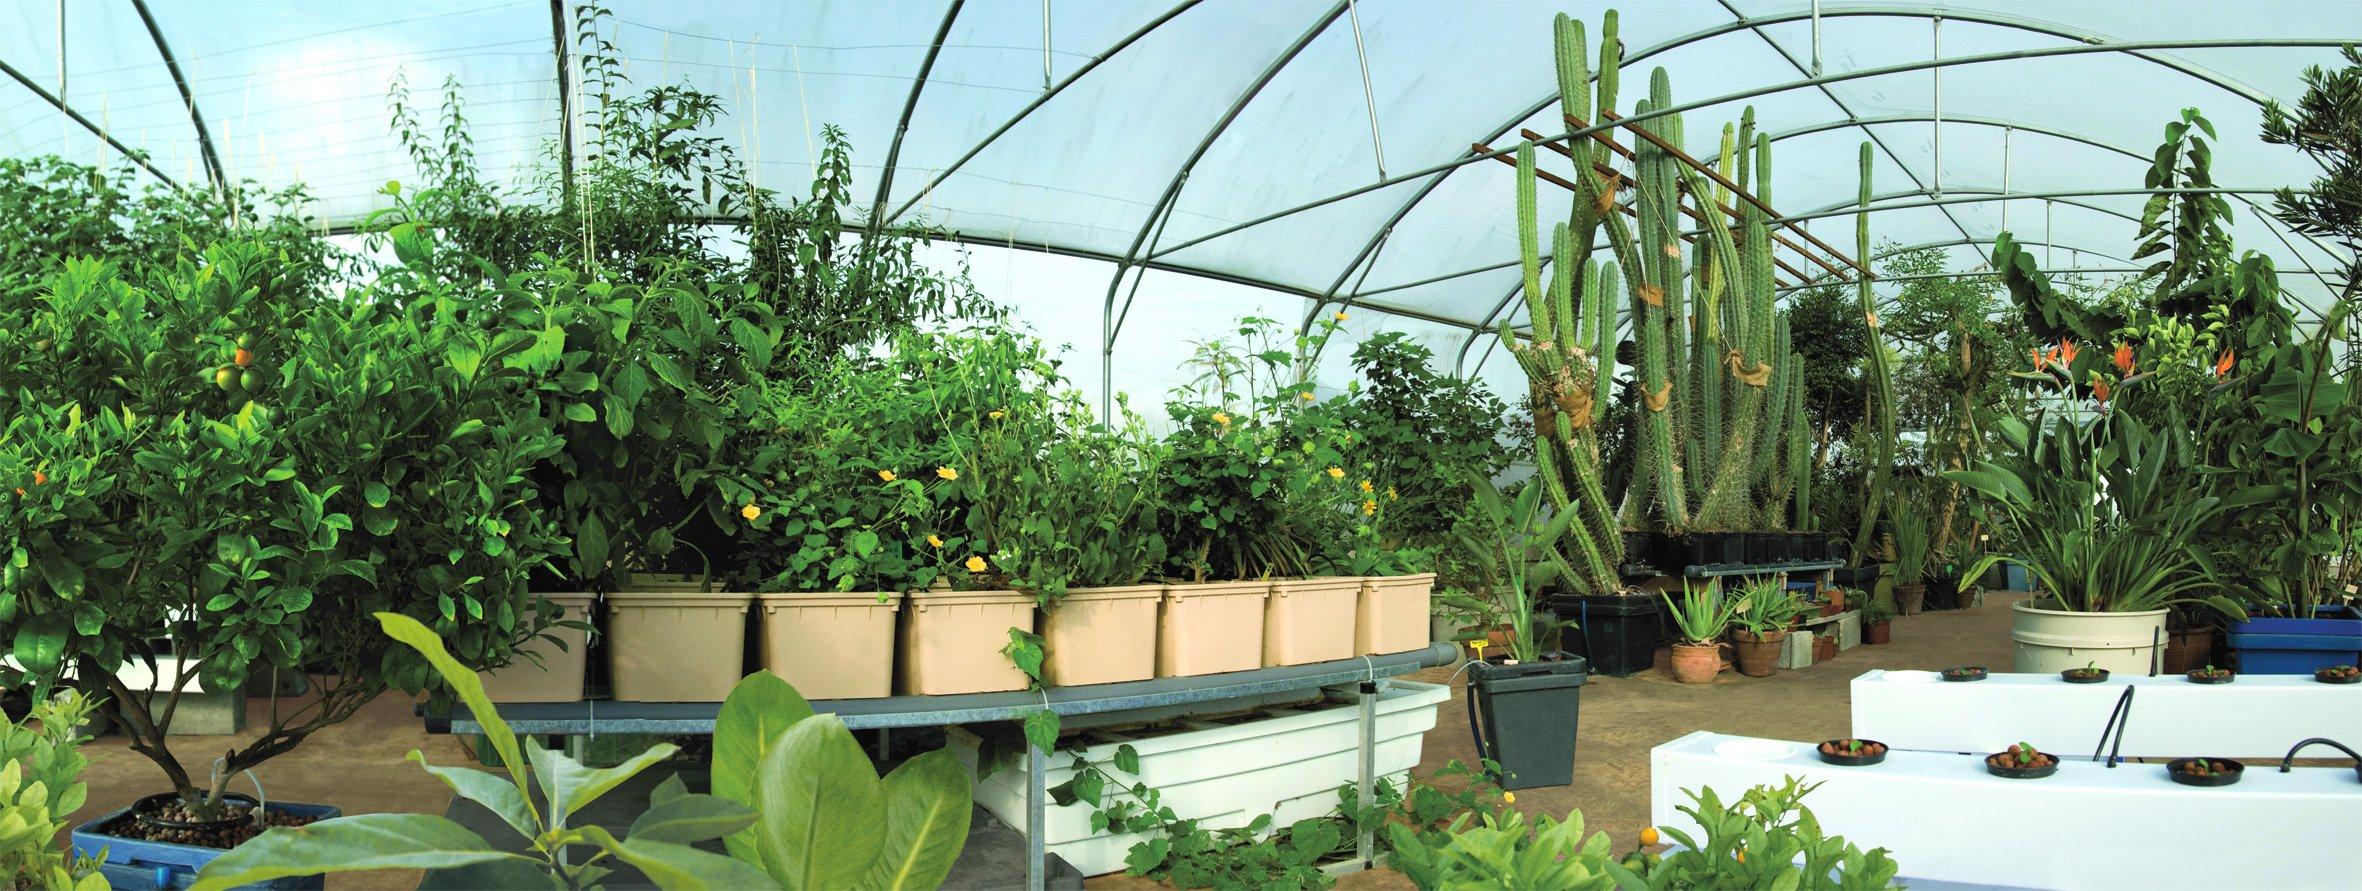 Гидропоника в домашних условиях зелень своими руками фото